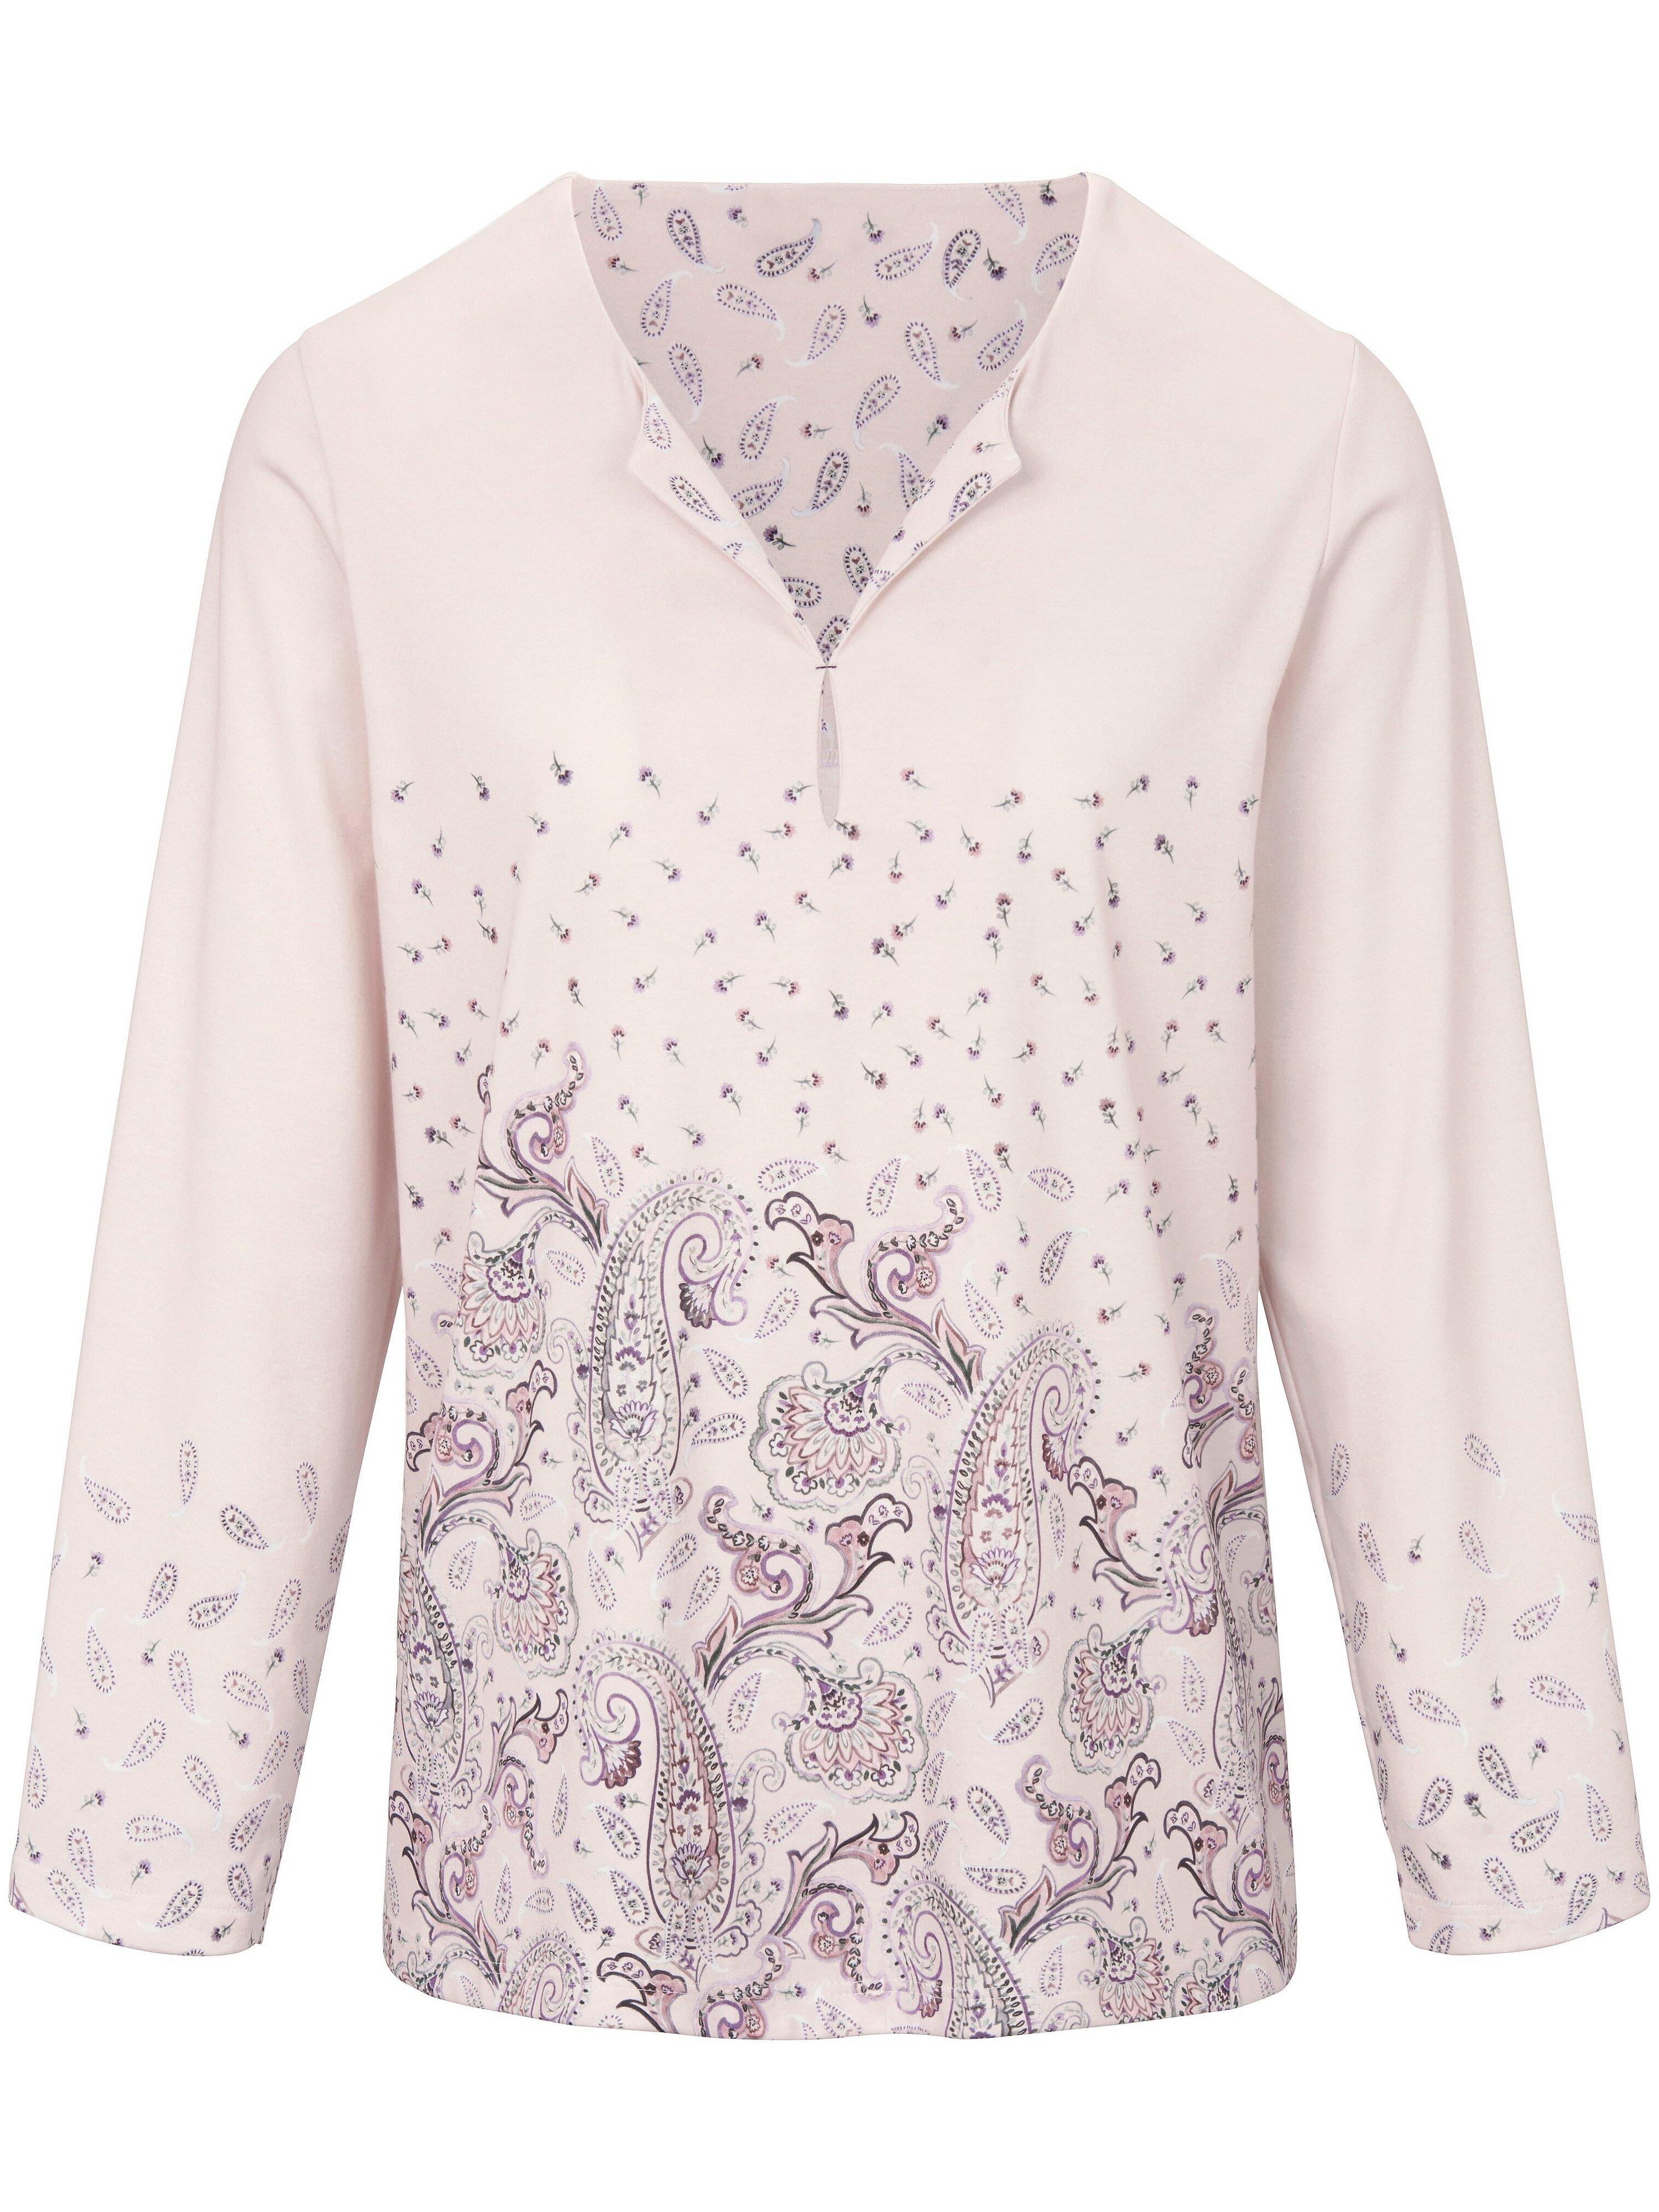 Le pyjama 100% coton  Hautnah rose taille 42